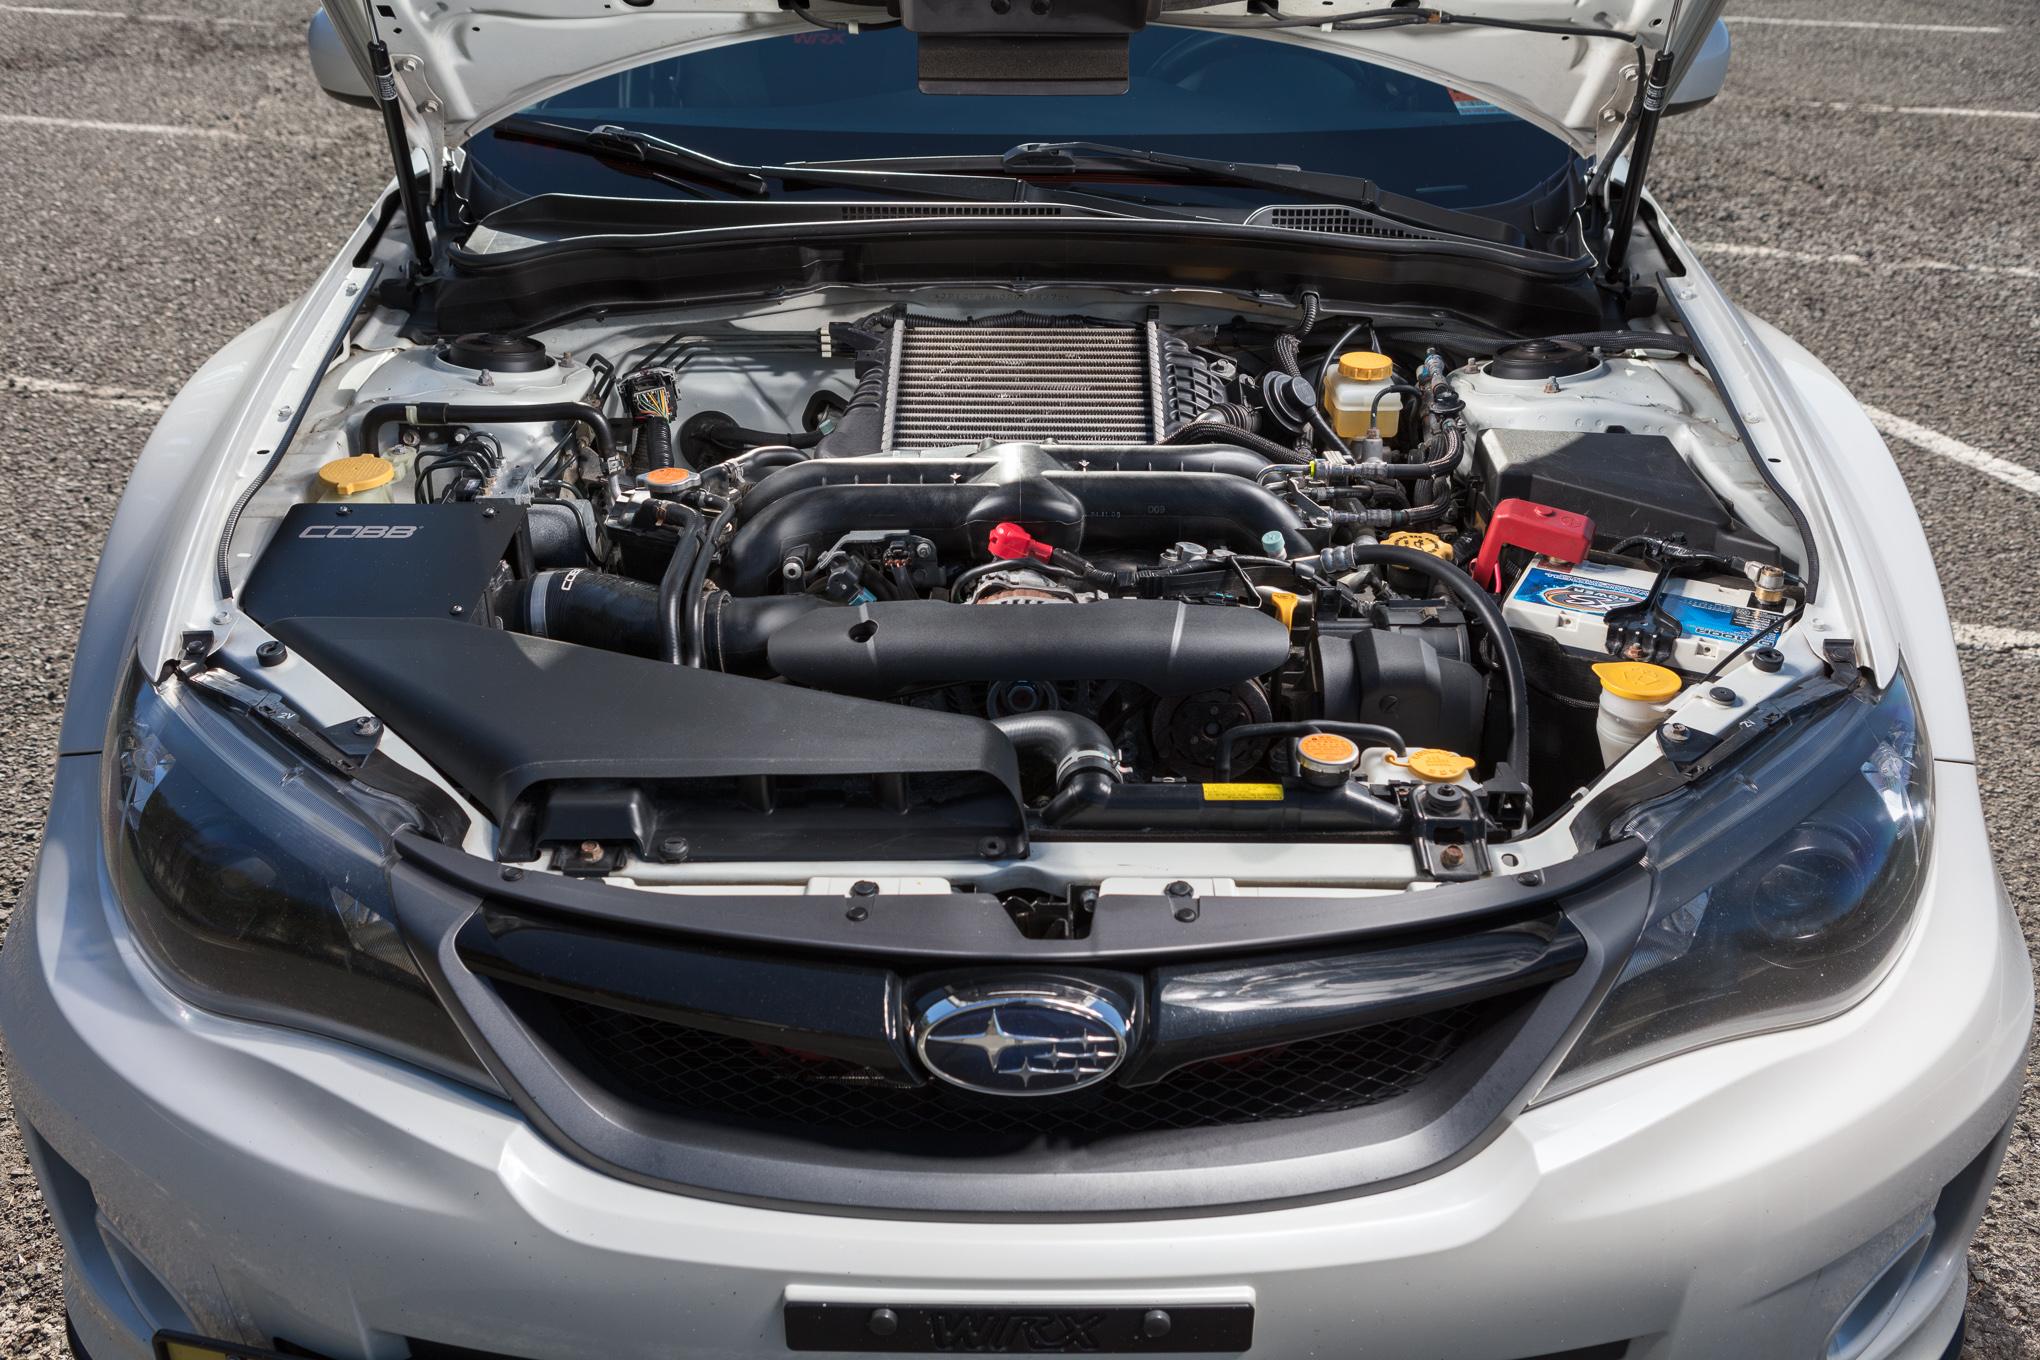 2013 Subaru WRX Hatchback, SWP-2013-subaru-wrx-0139-web-jpg